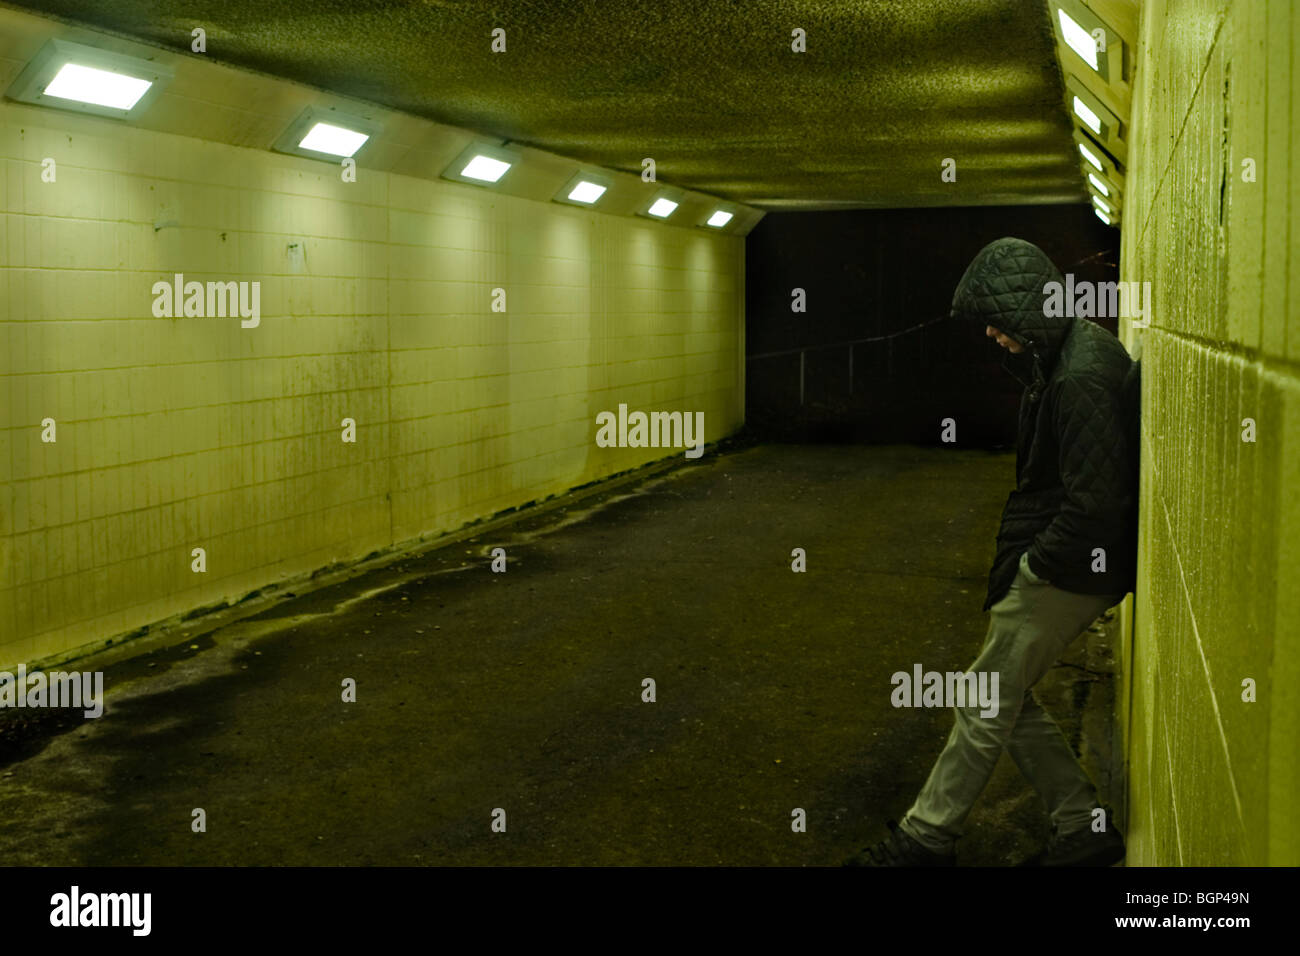 Teenage boy leaning against subway wall at night, London UK - Stock Image